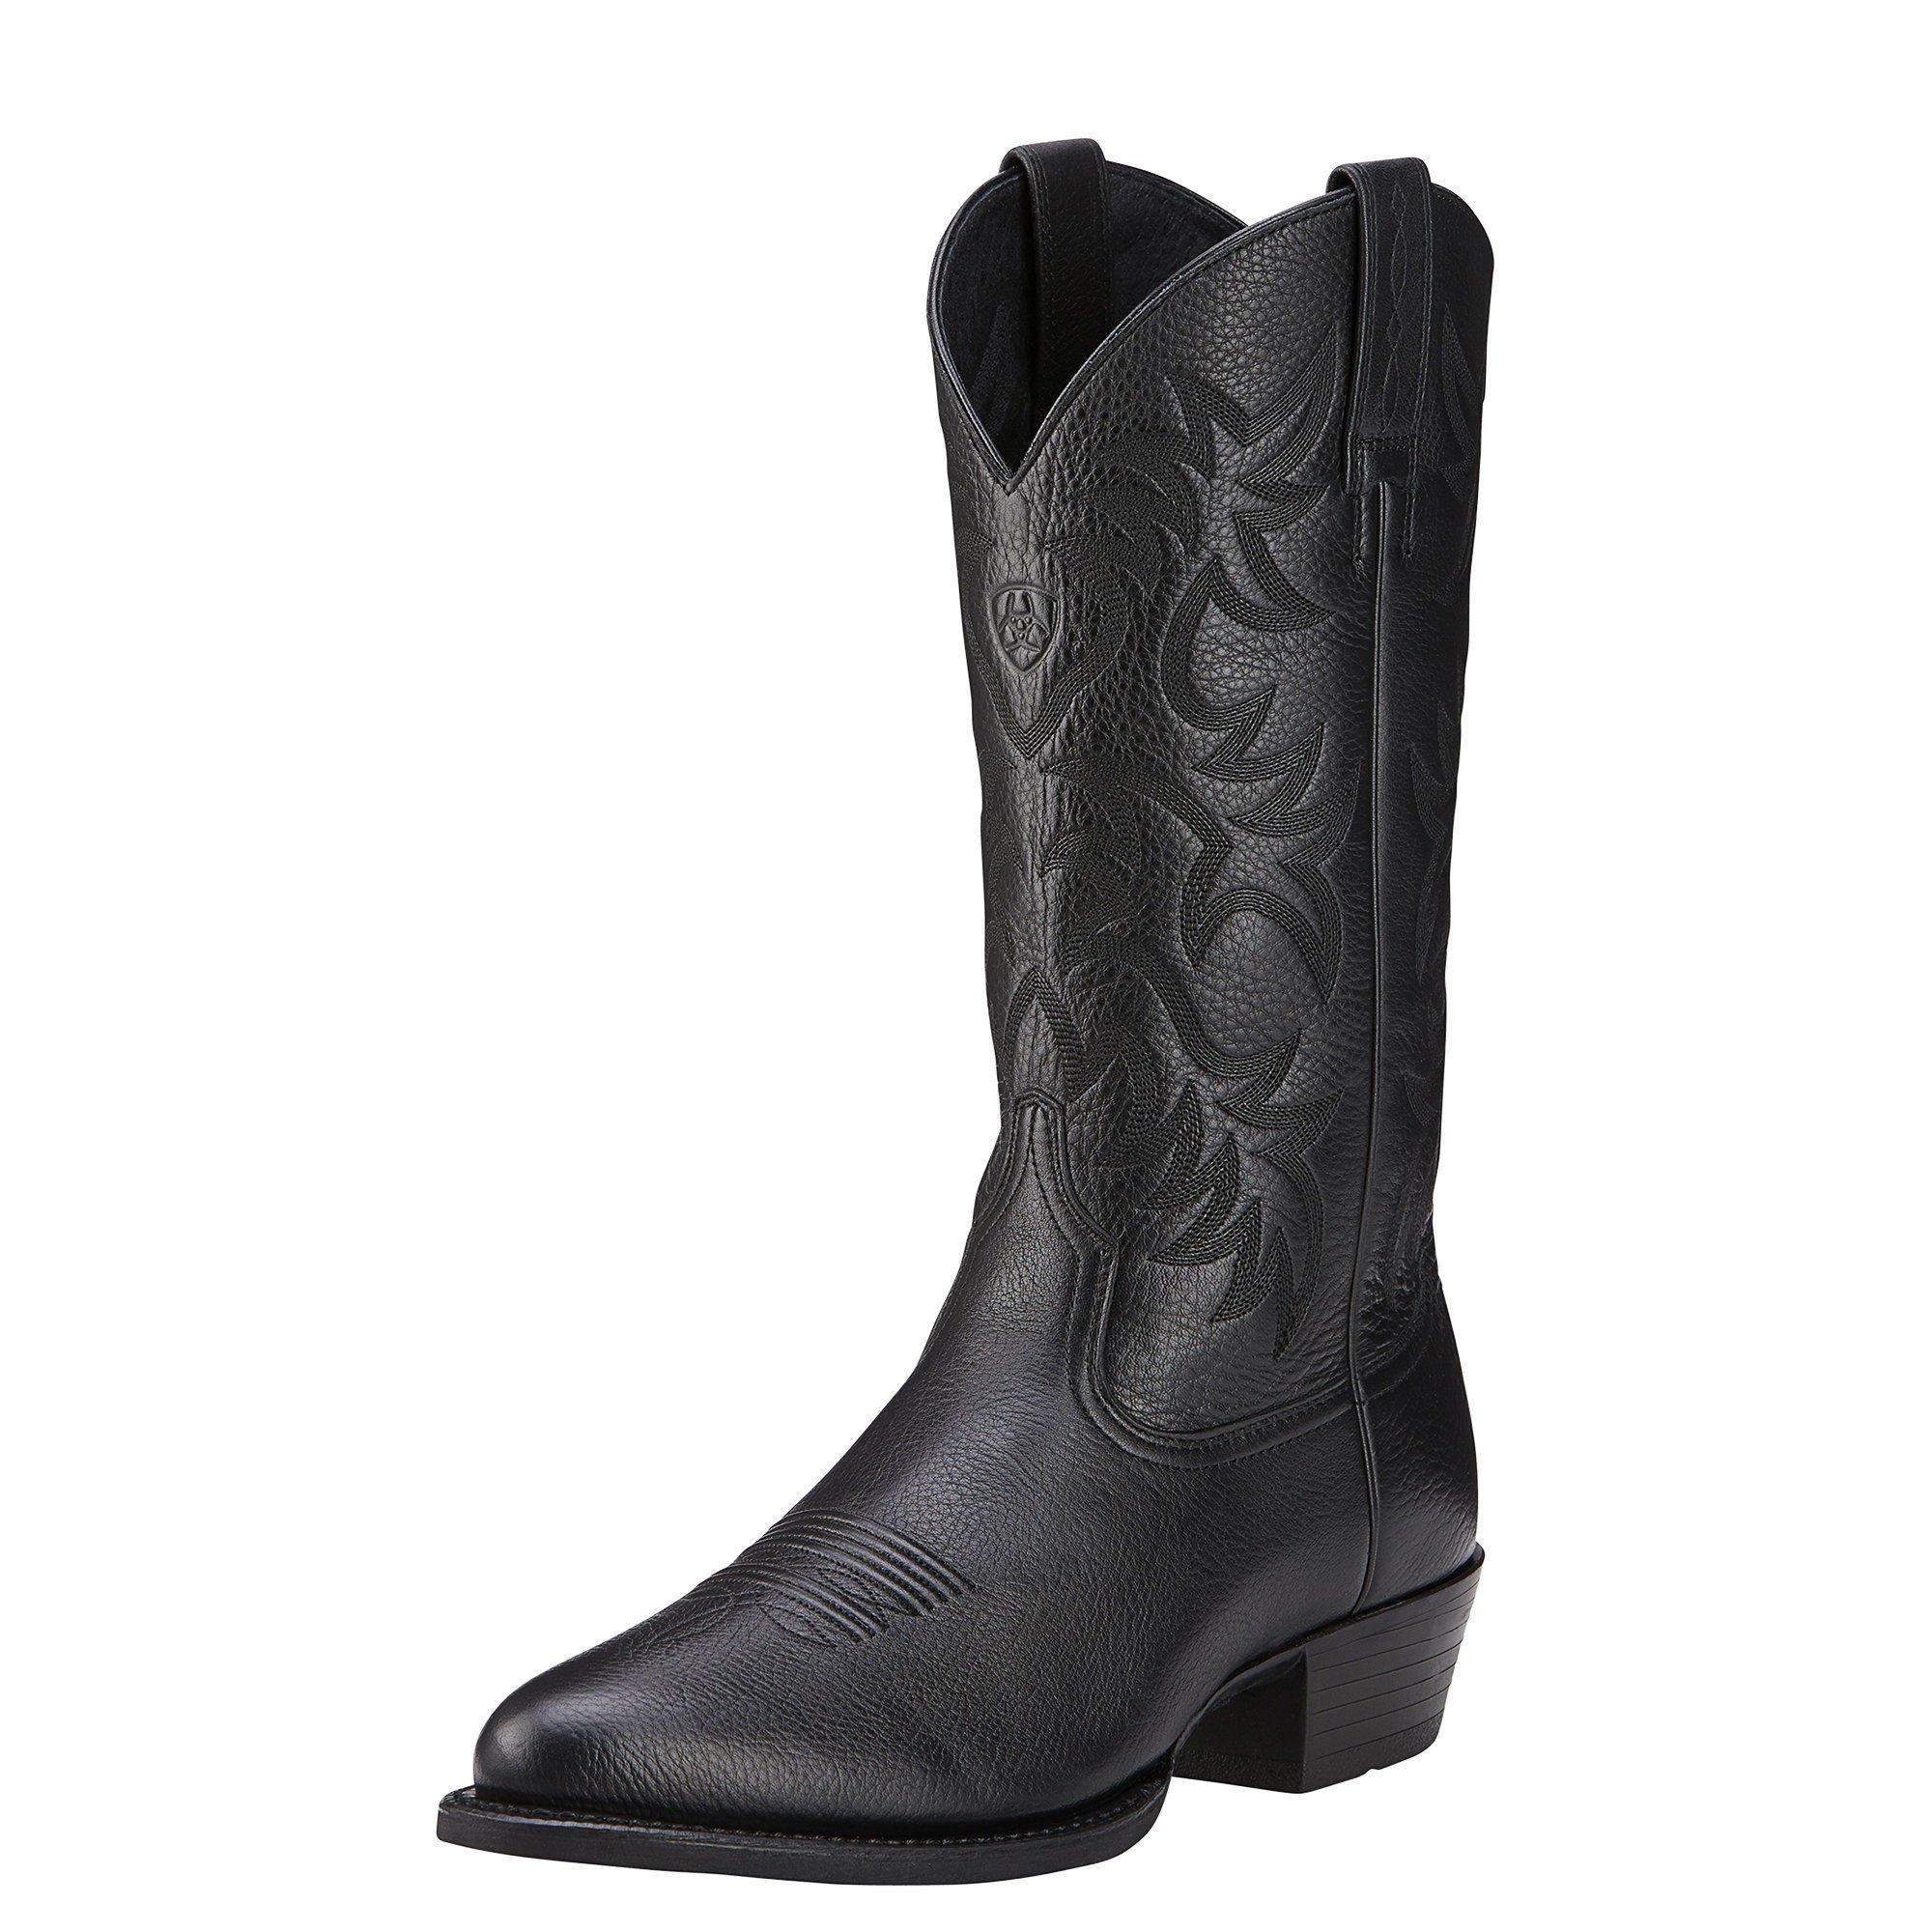 Ariat Men's Heritage Western R Toe Cowboy Boot, Black Deer Tan, 10 D US